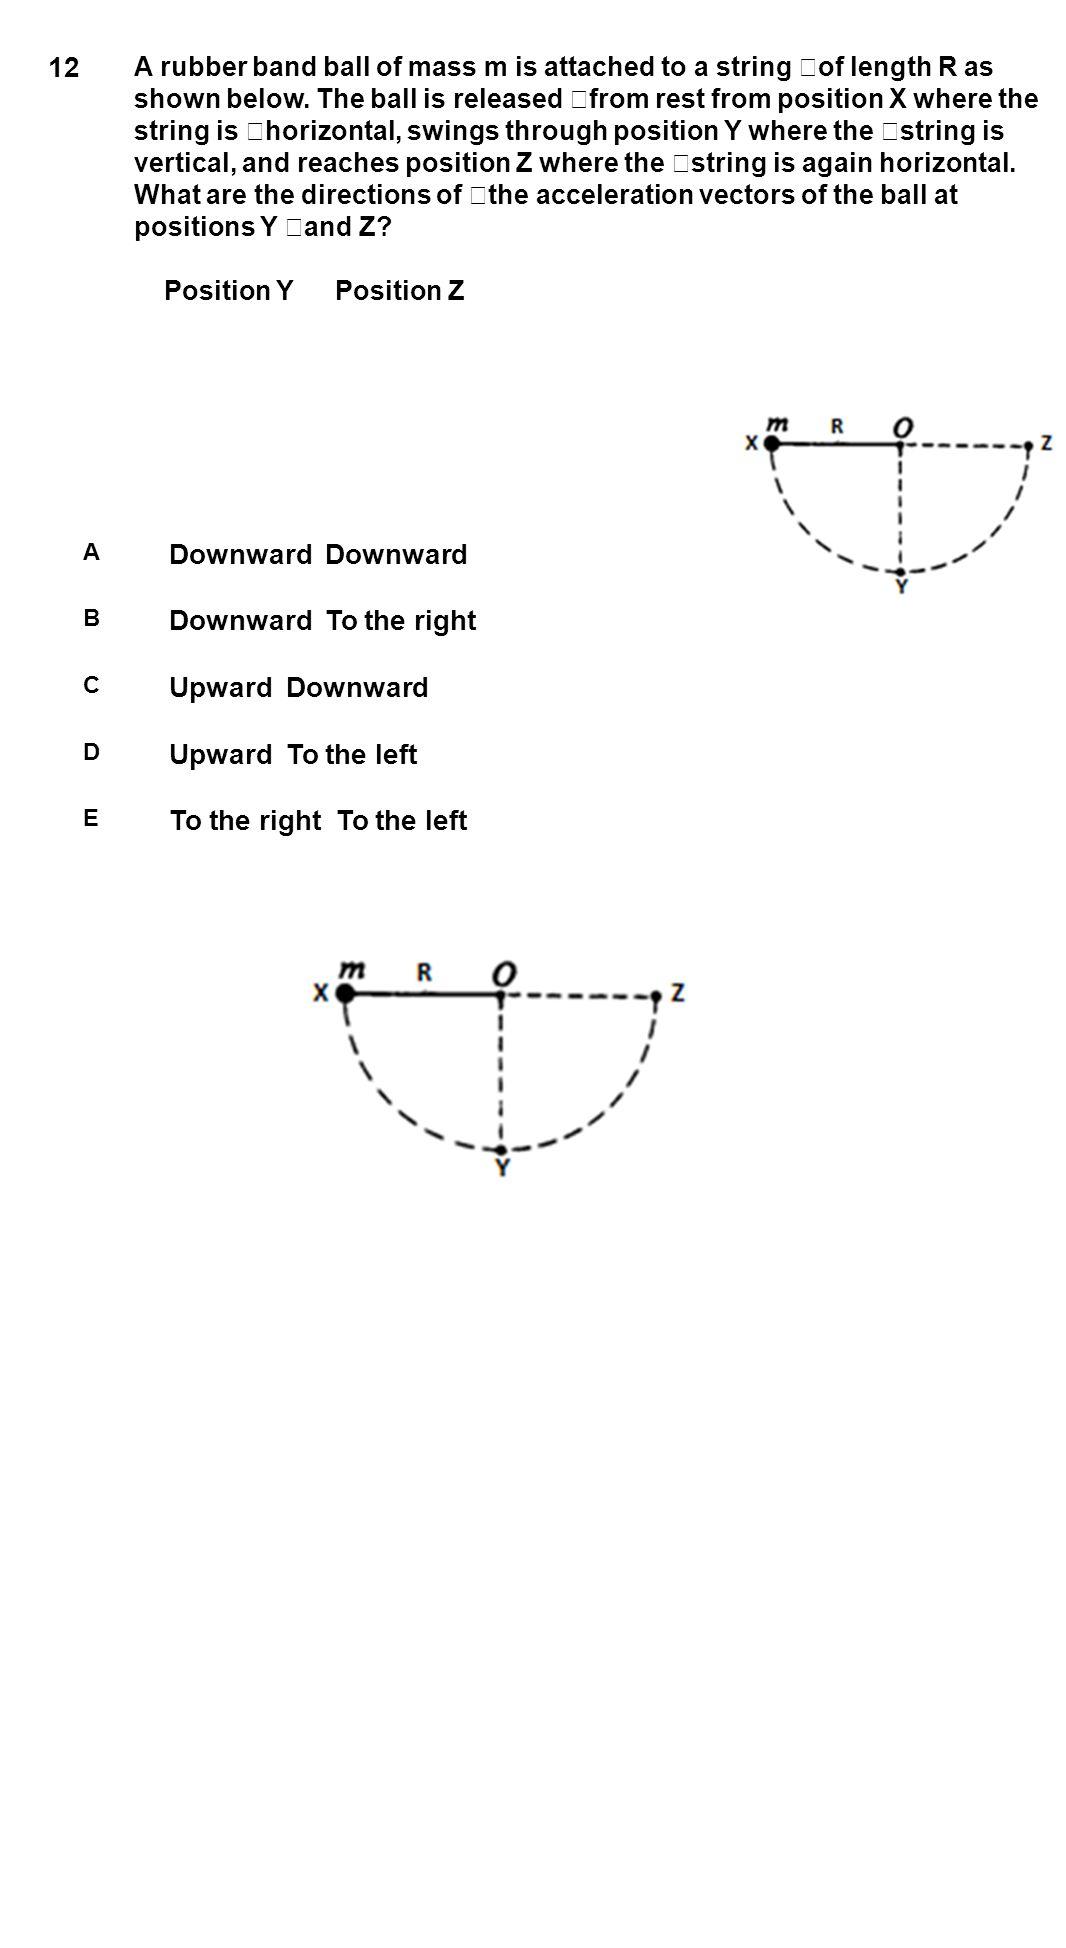 12 Downward Downward Downward To the right Upward Downward